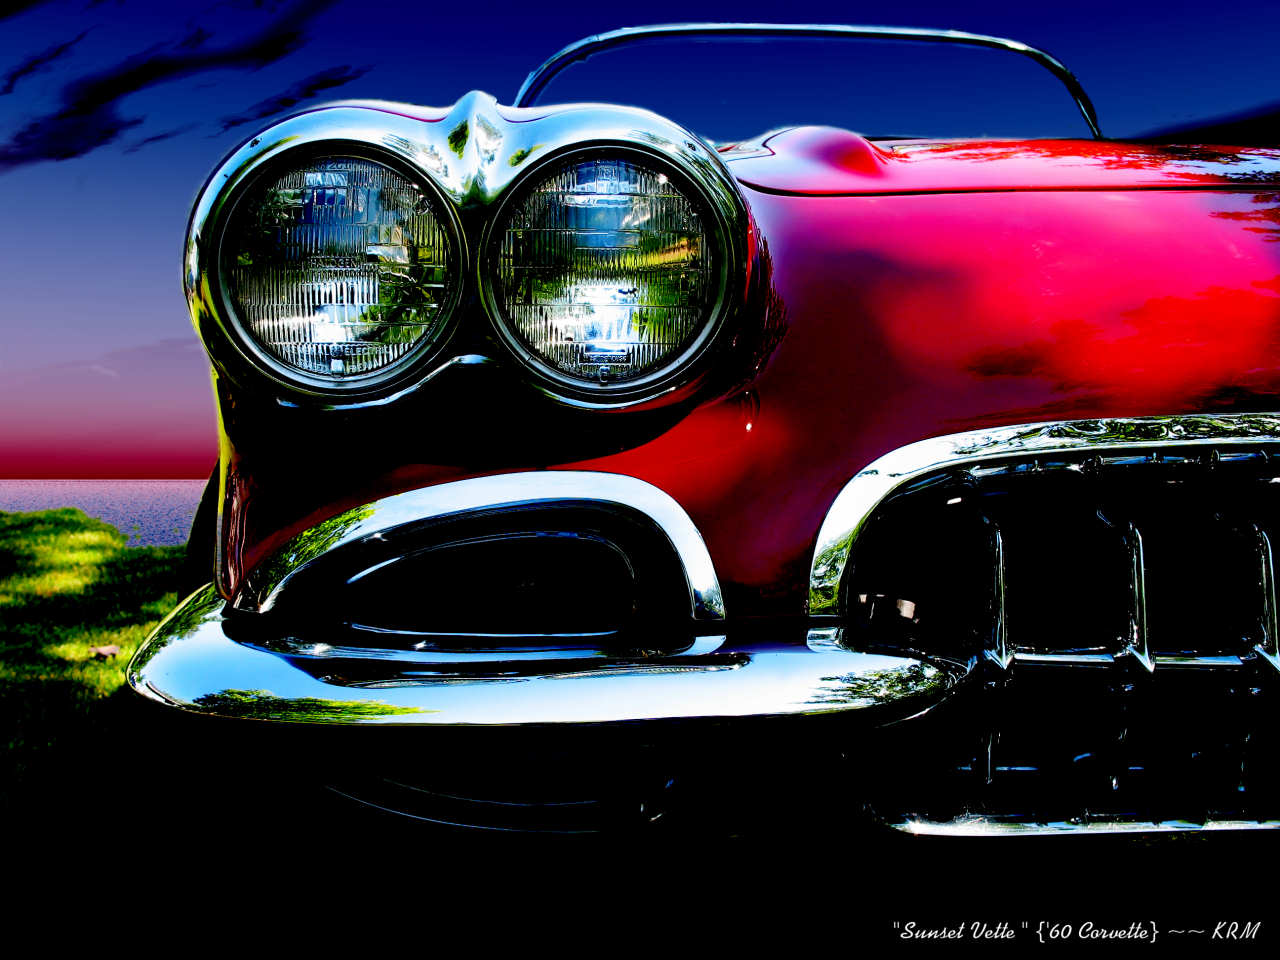 Click image for larger version  Name:KRM-CARS08-1960 Corvette=KRM.jpg Views:182 Size:153.8 KB ID:21533